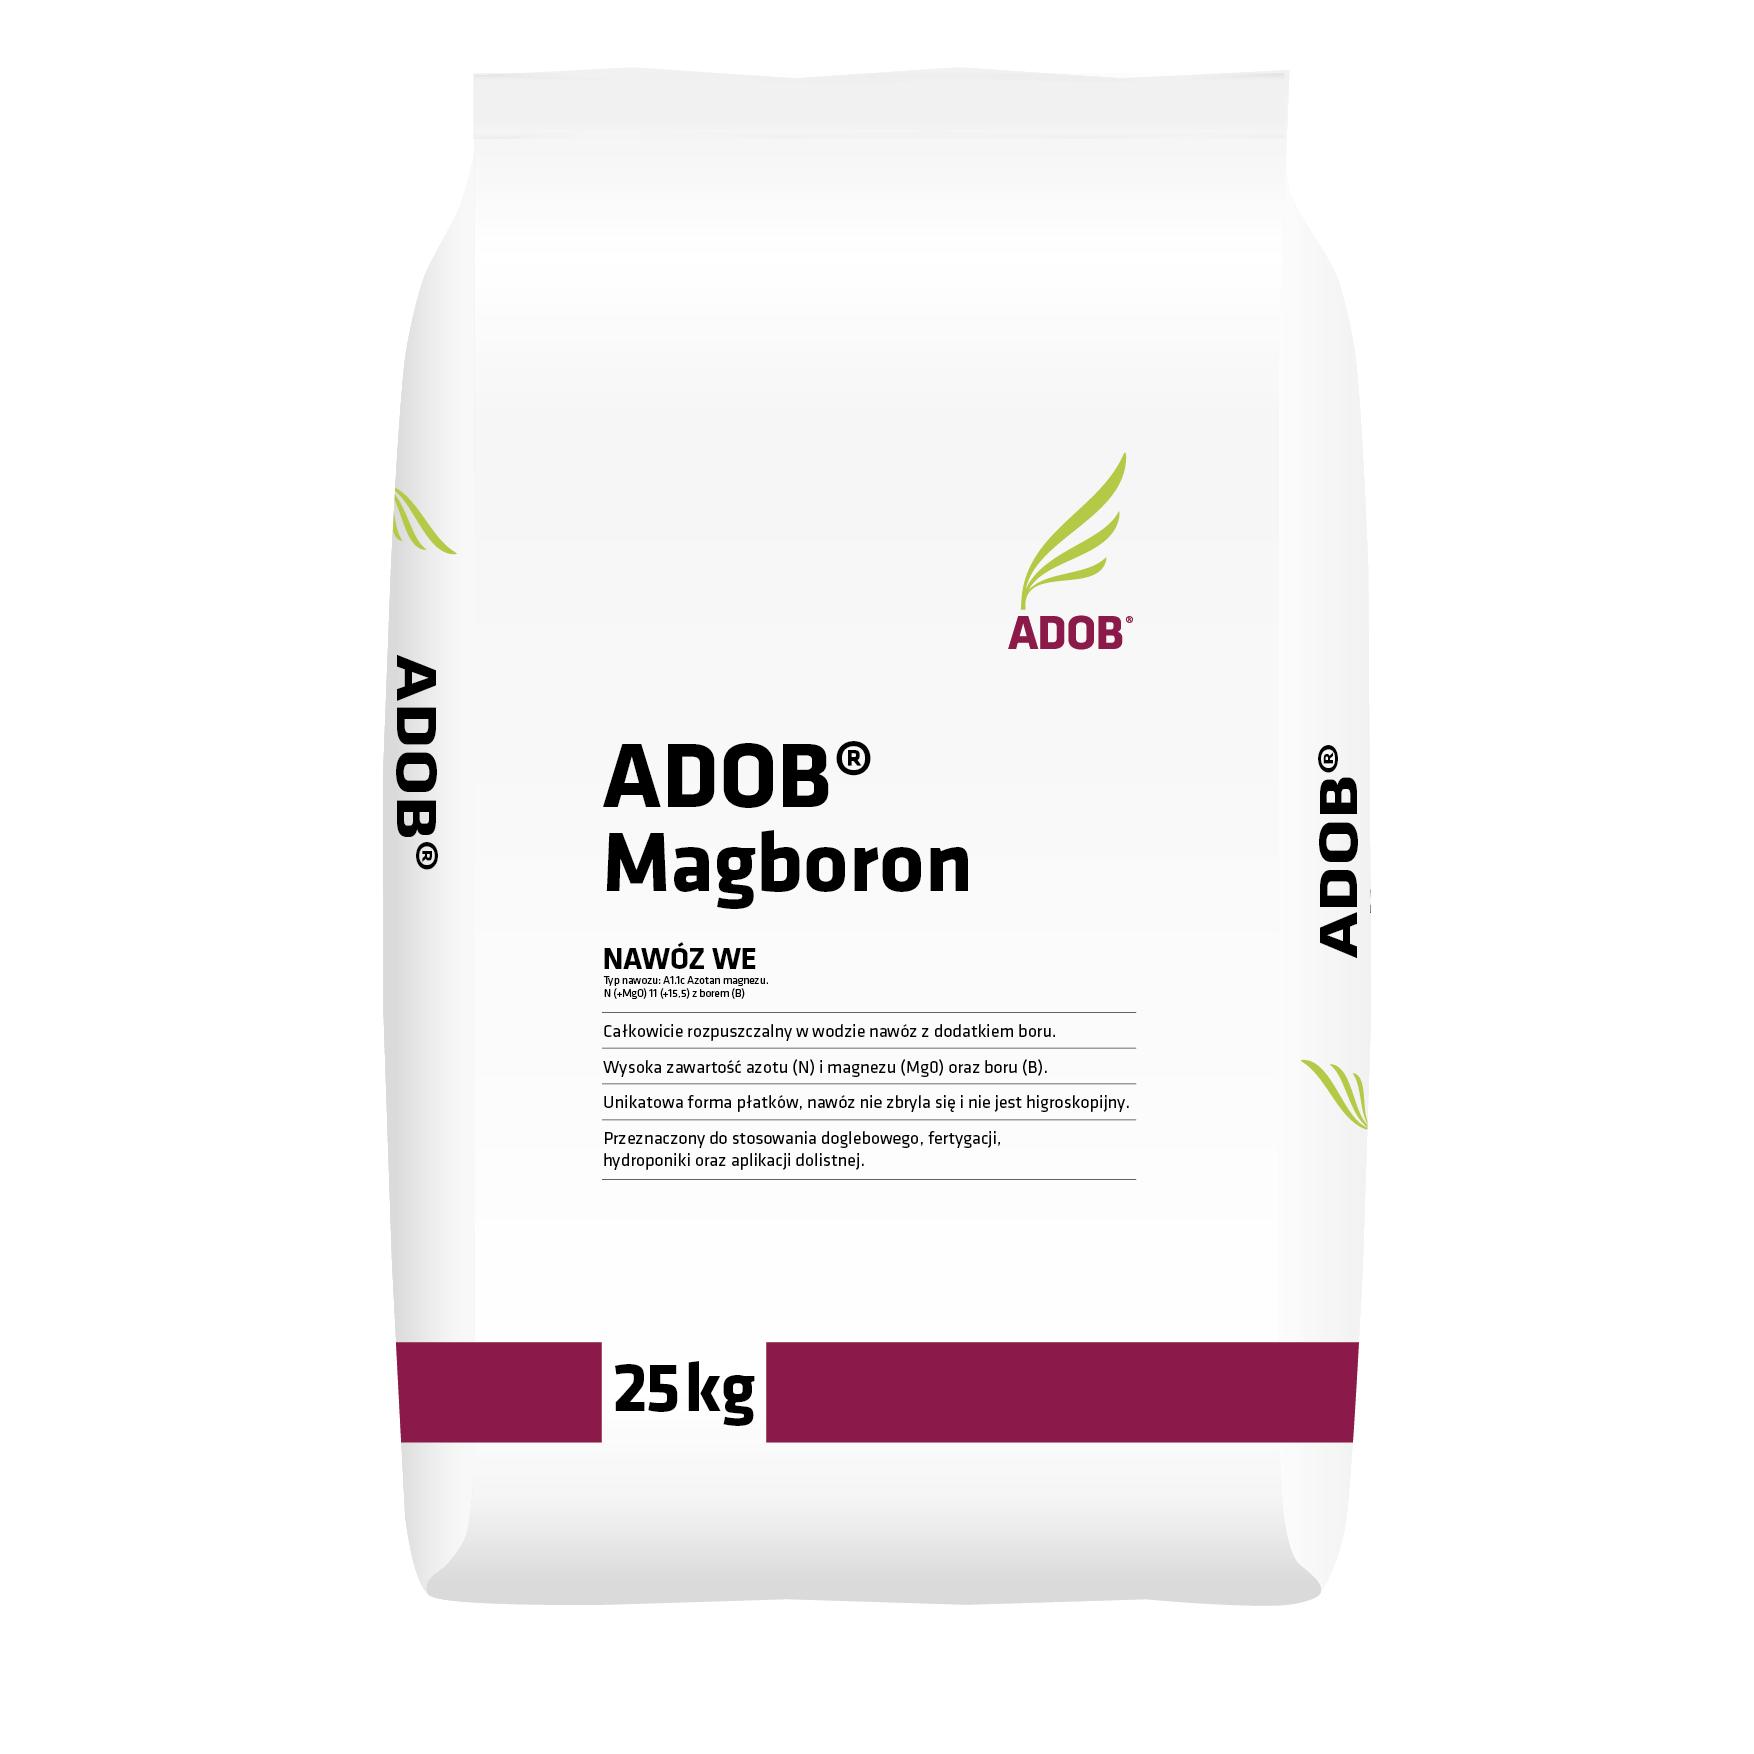 ADOB Magboron